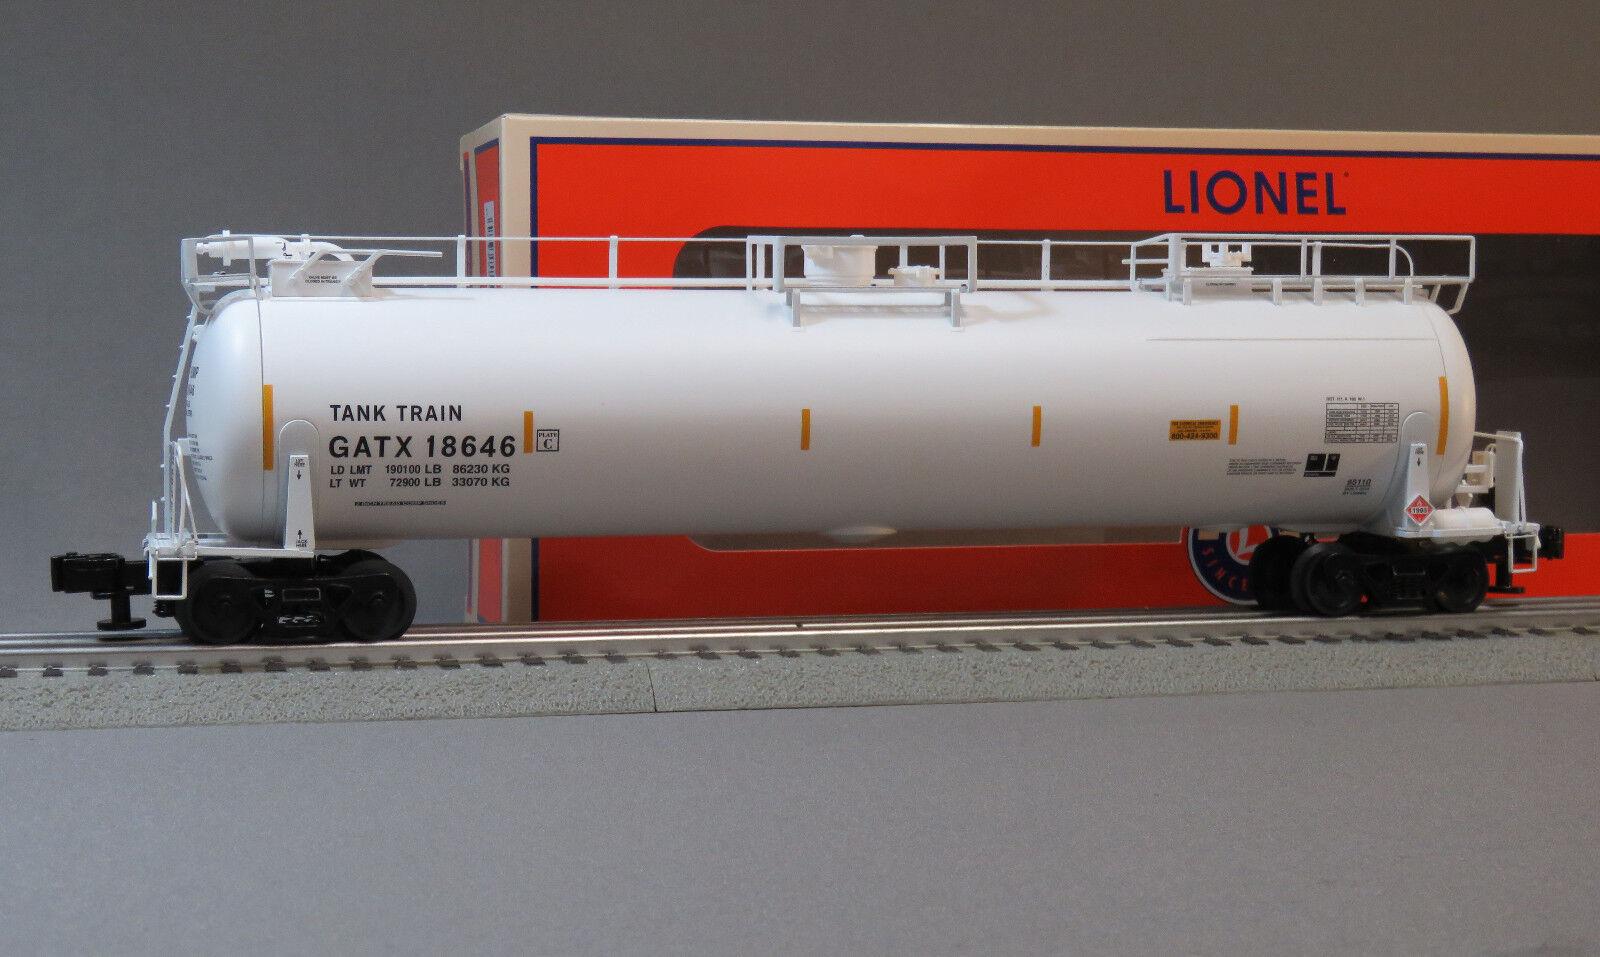 LIONEL GATX TANKTRAIN SCALE TANK CAR O GAUGE 85108 train freight ETD 6-85110 NEW